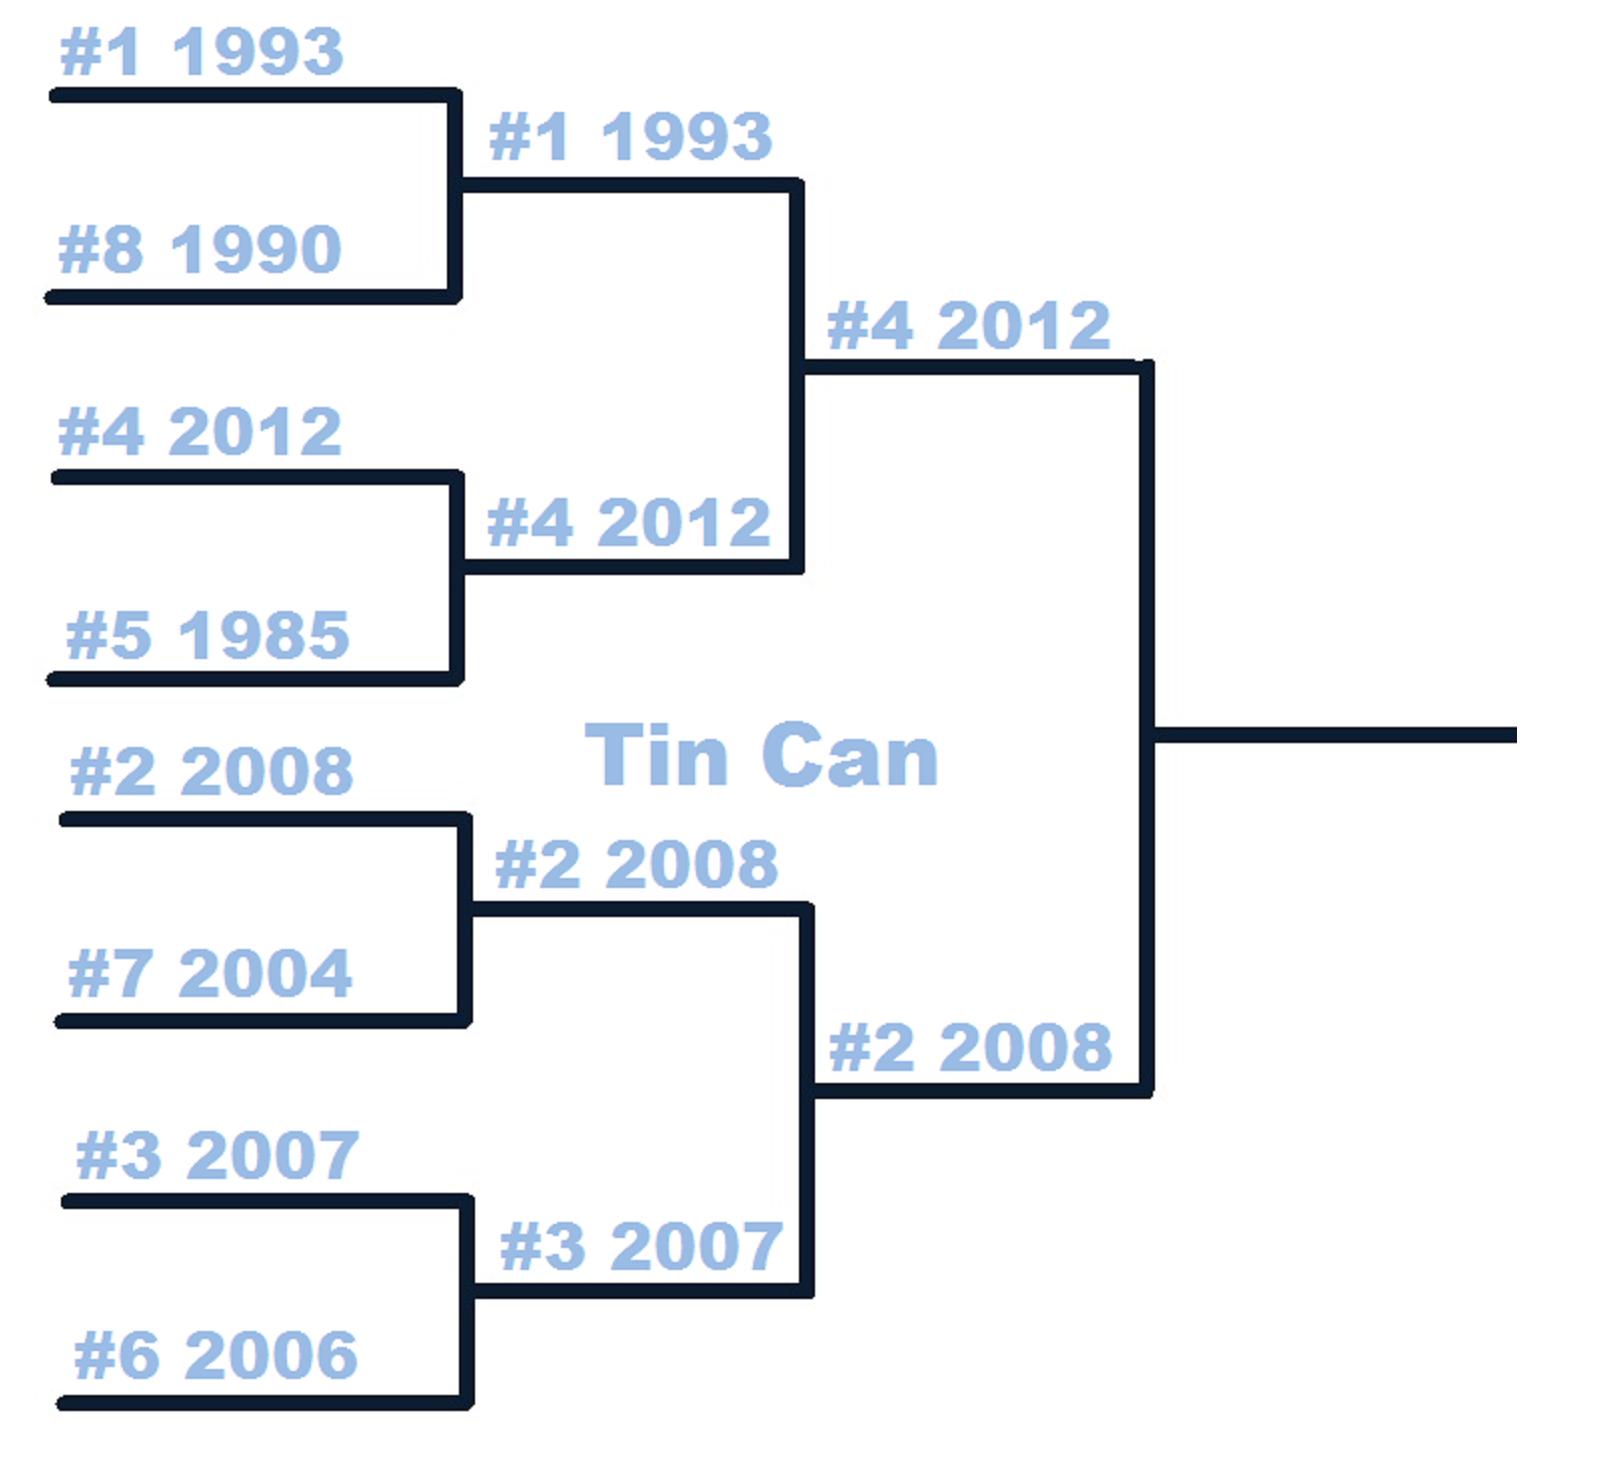 Thb_countdown_tournament-tin_can-2nd_medium